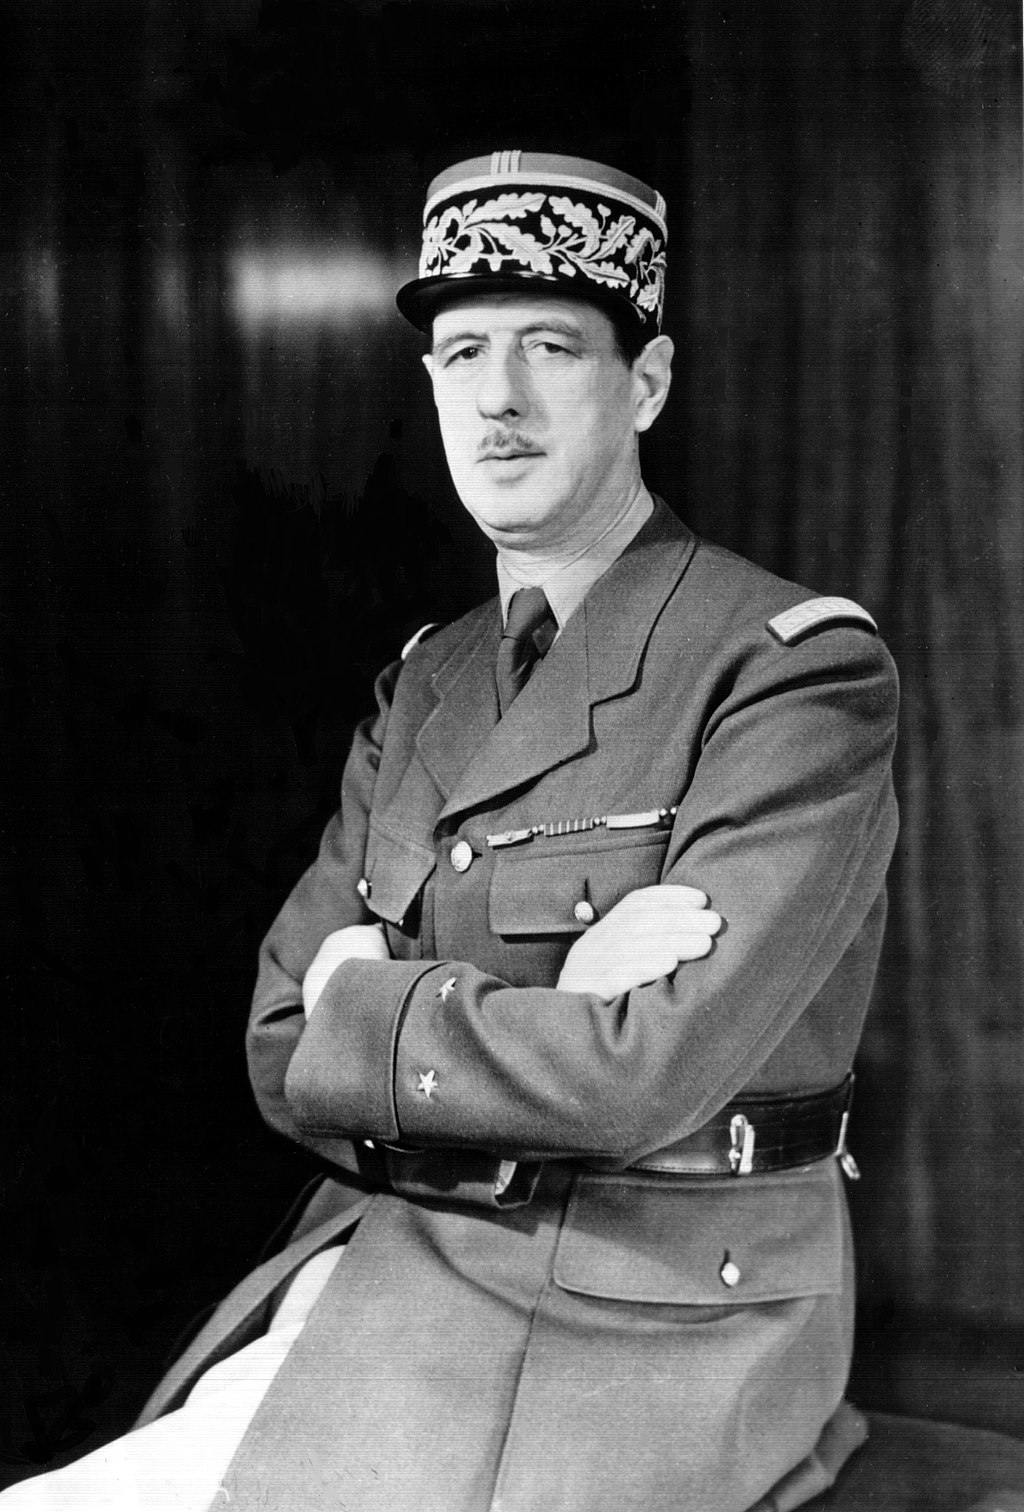 De Gaulle during World War II. (Wikimedia)